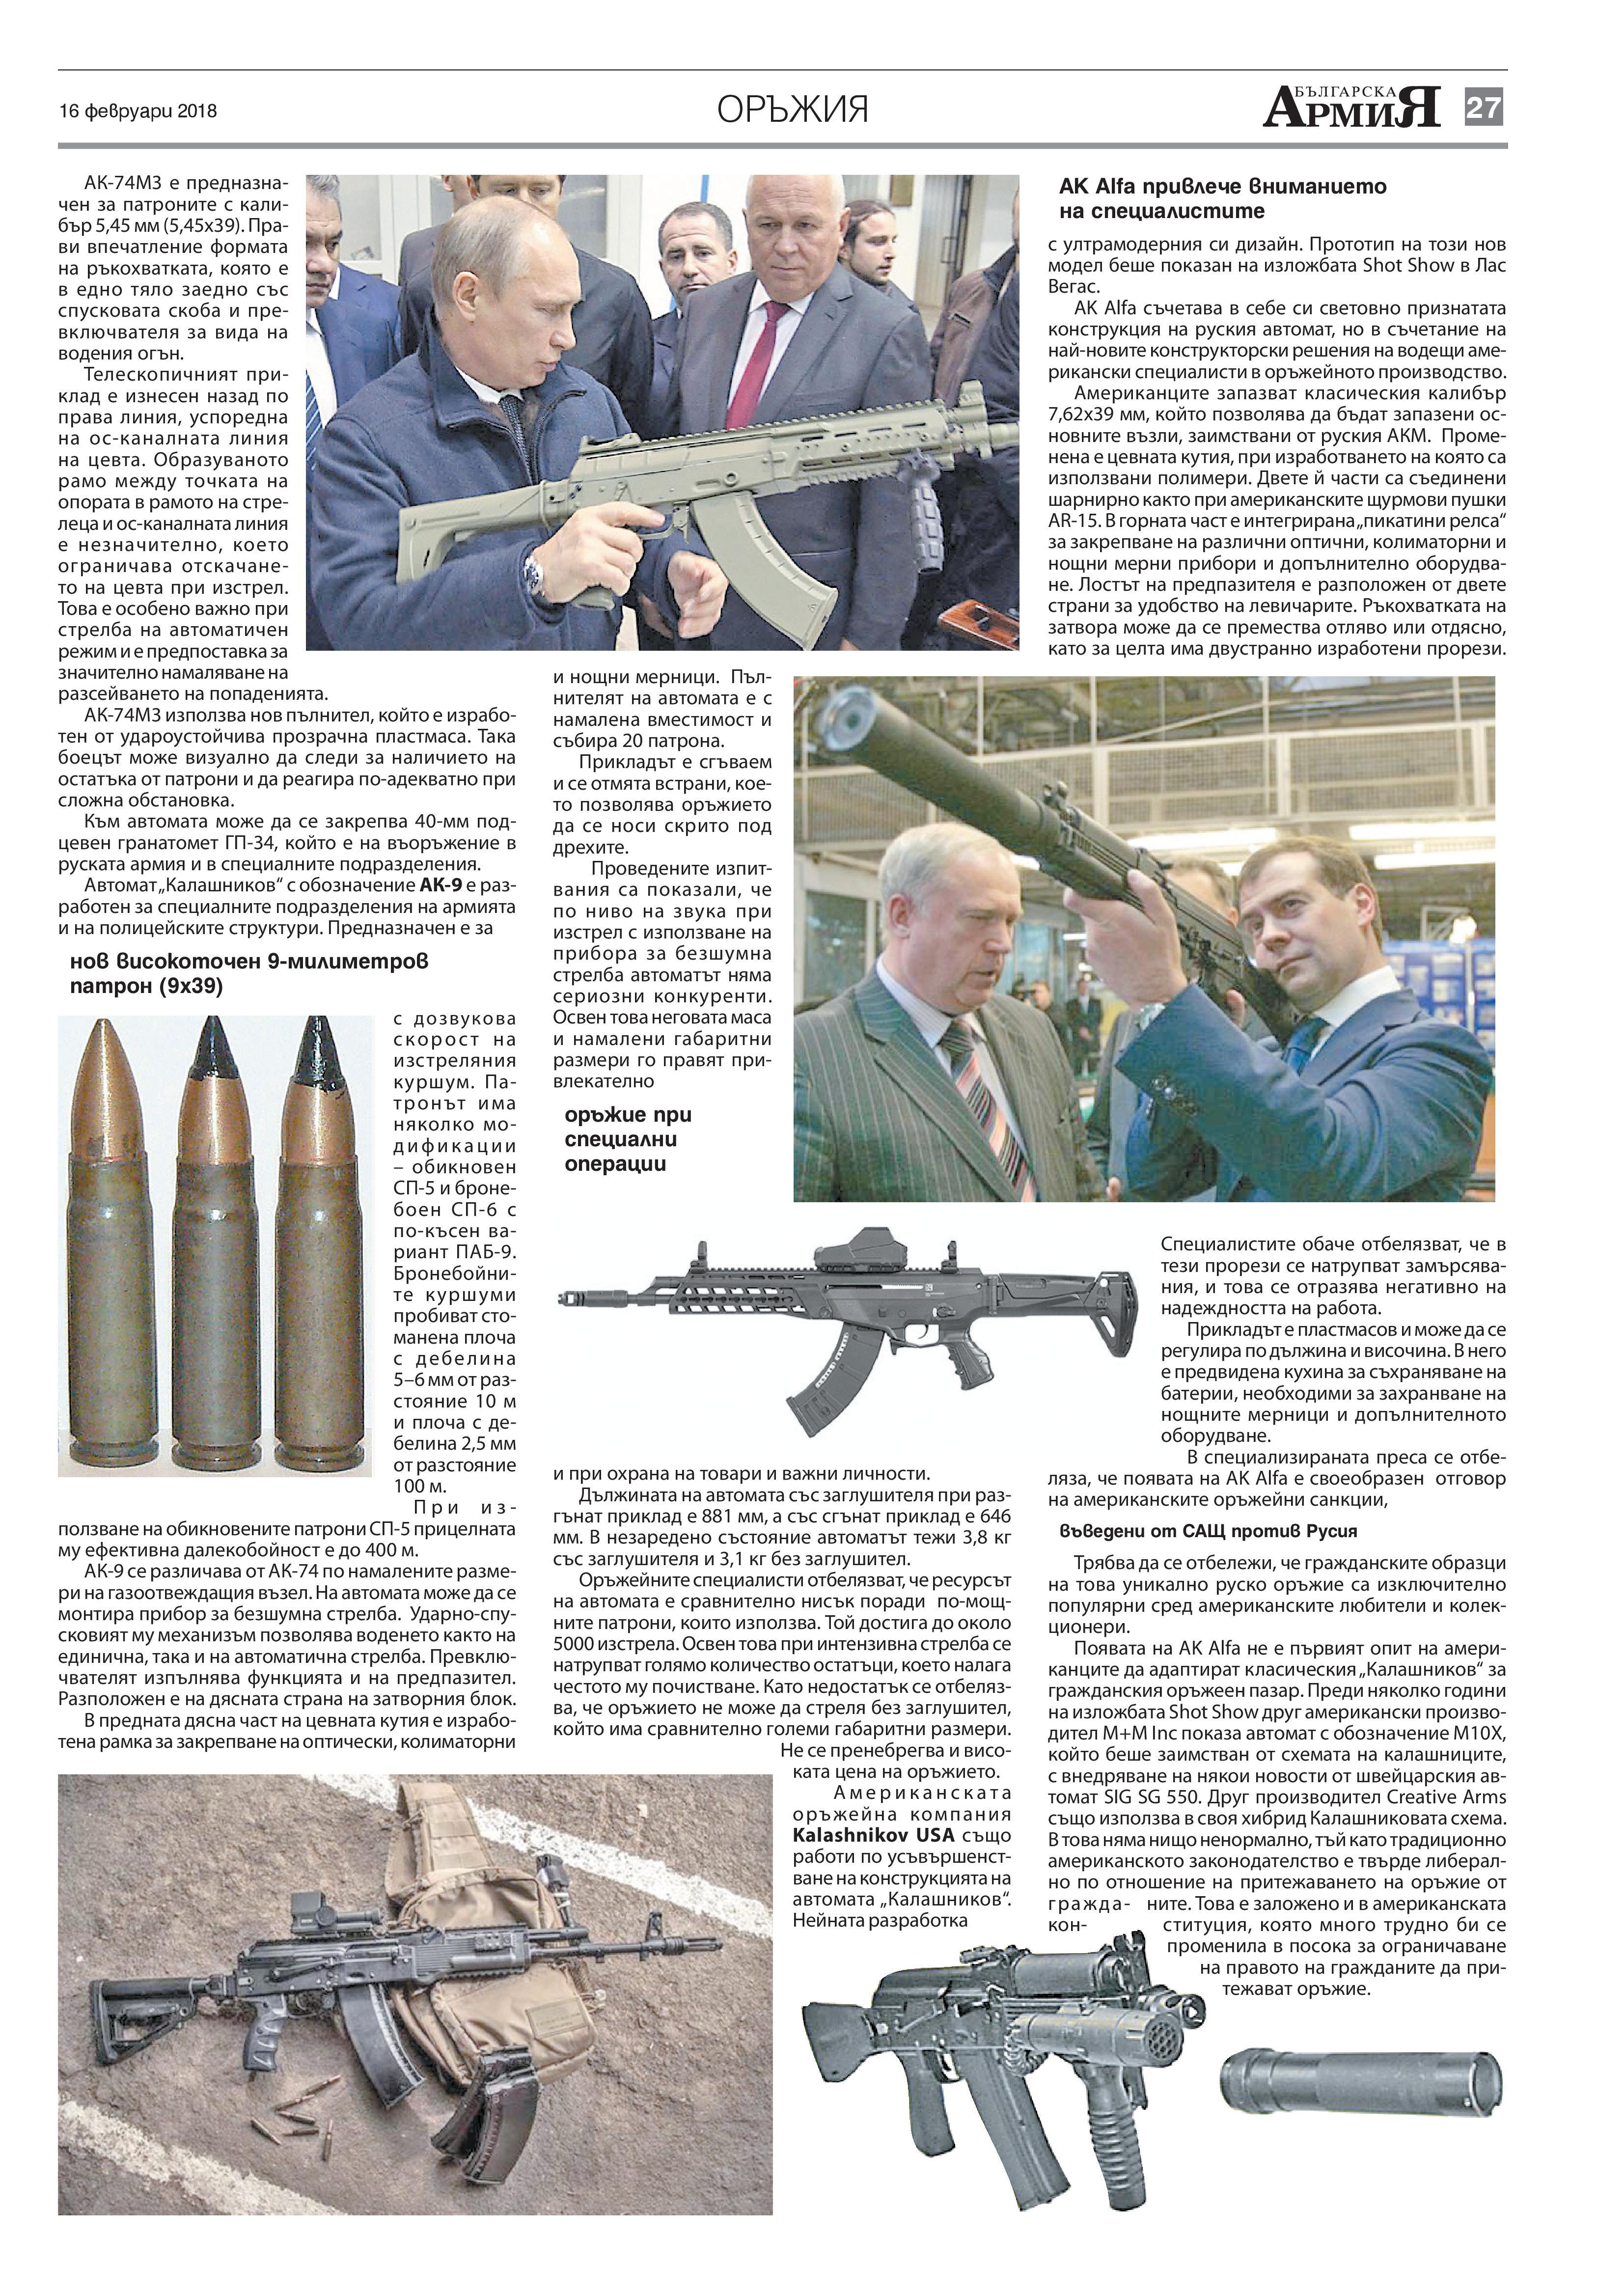 http://armymedia.bg/wp-content/uploads/2015/06/27-19.jpg